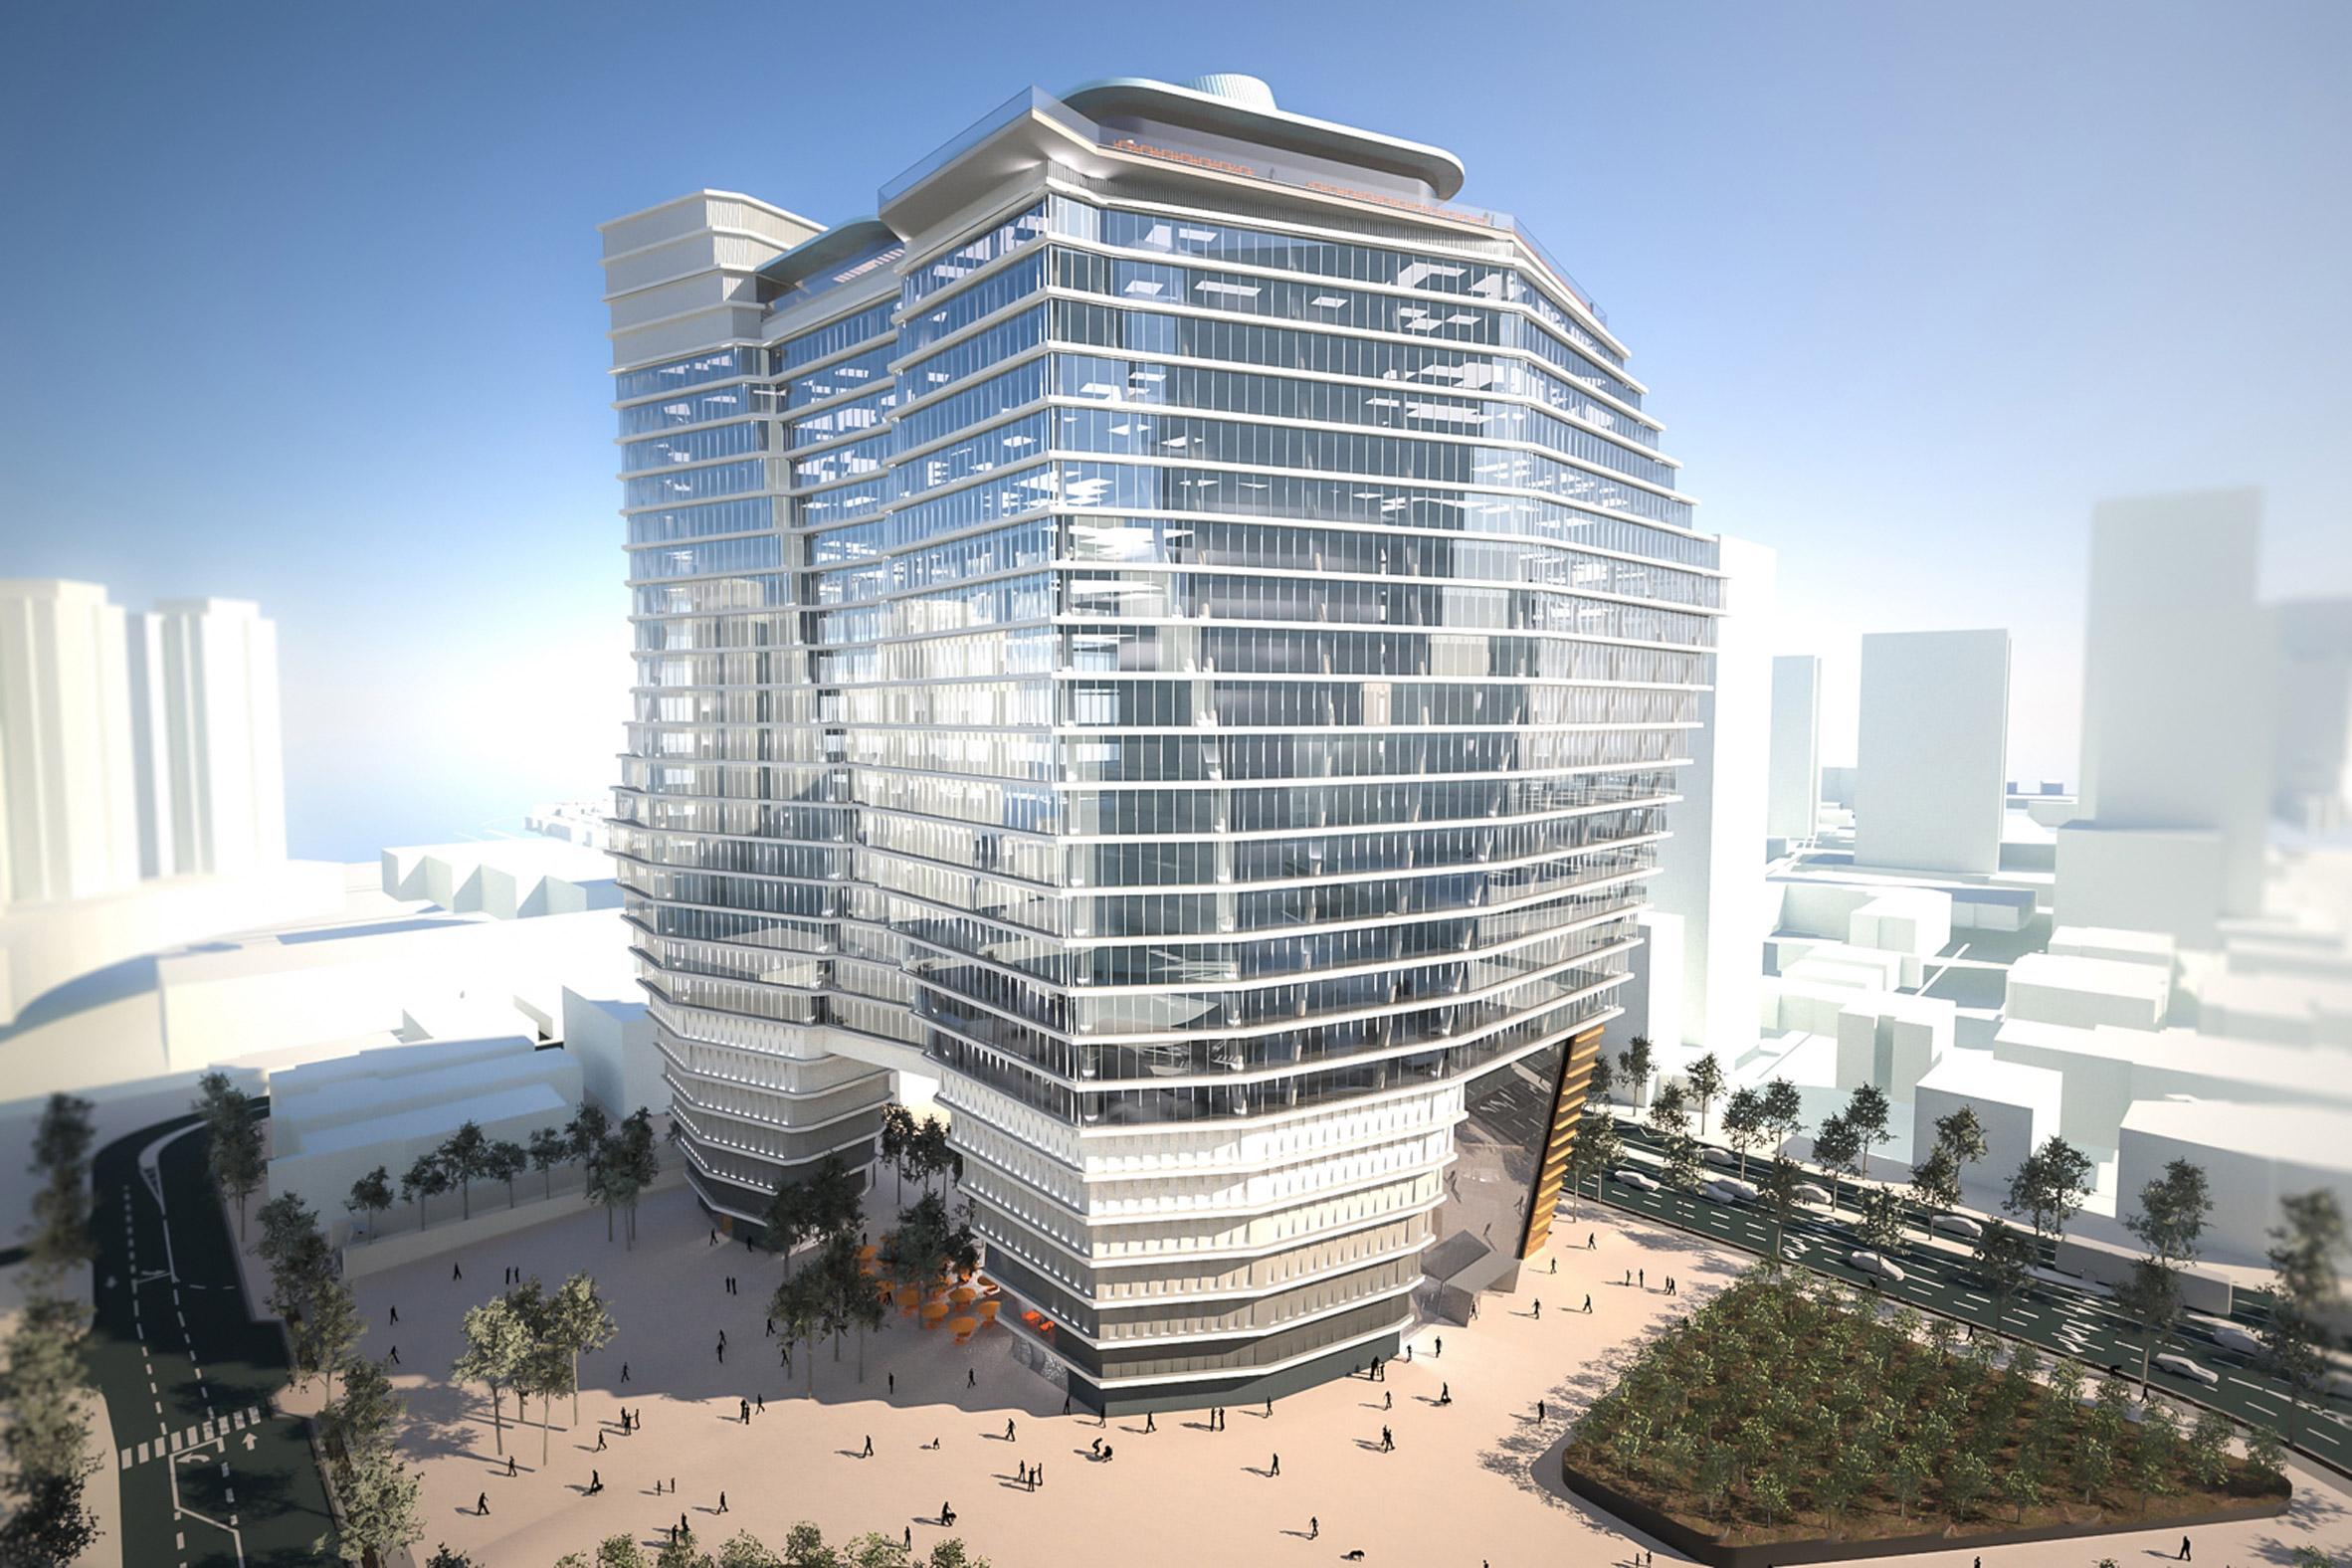 toha-tel-aviv-ron-arad-architecture-news_dezeen_2364_col_2.jpg